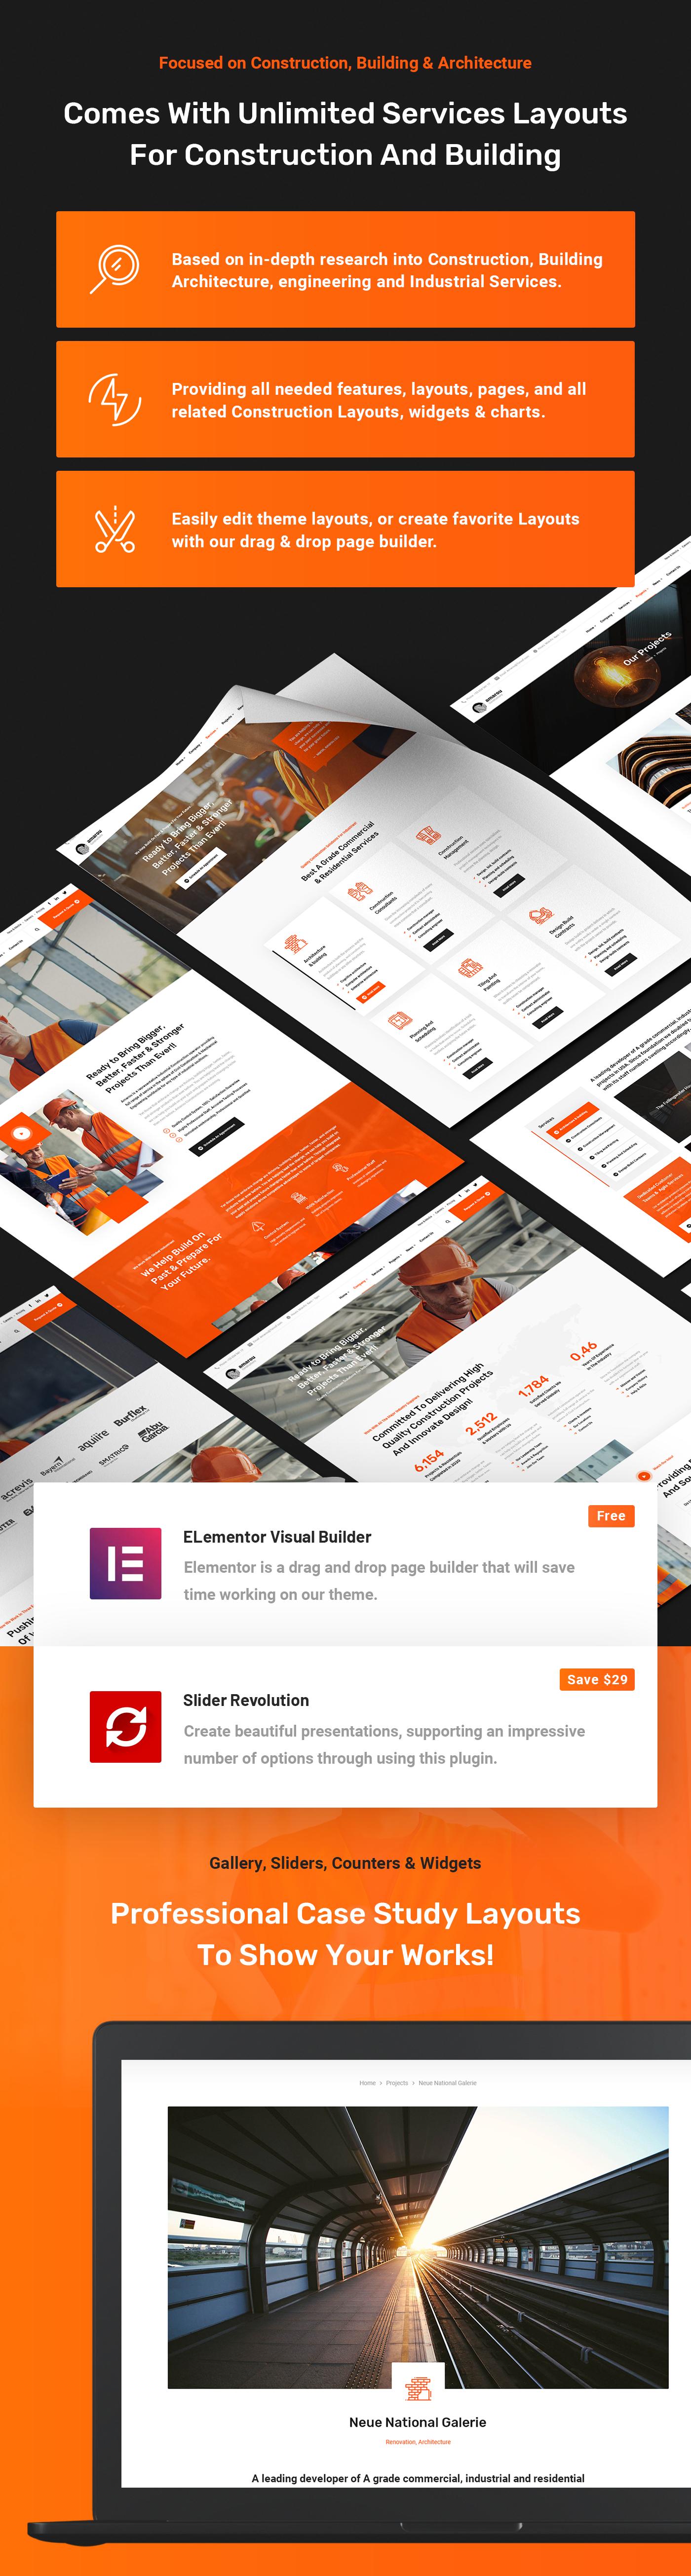 Amarou - Construction, Building & Architecture Business WordPress Theme - 3